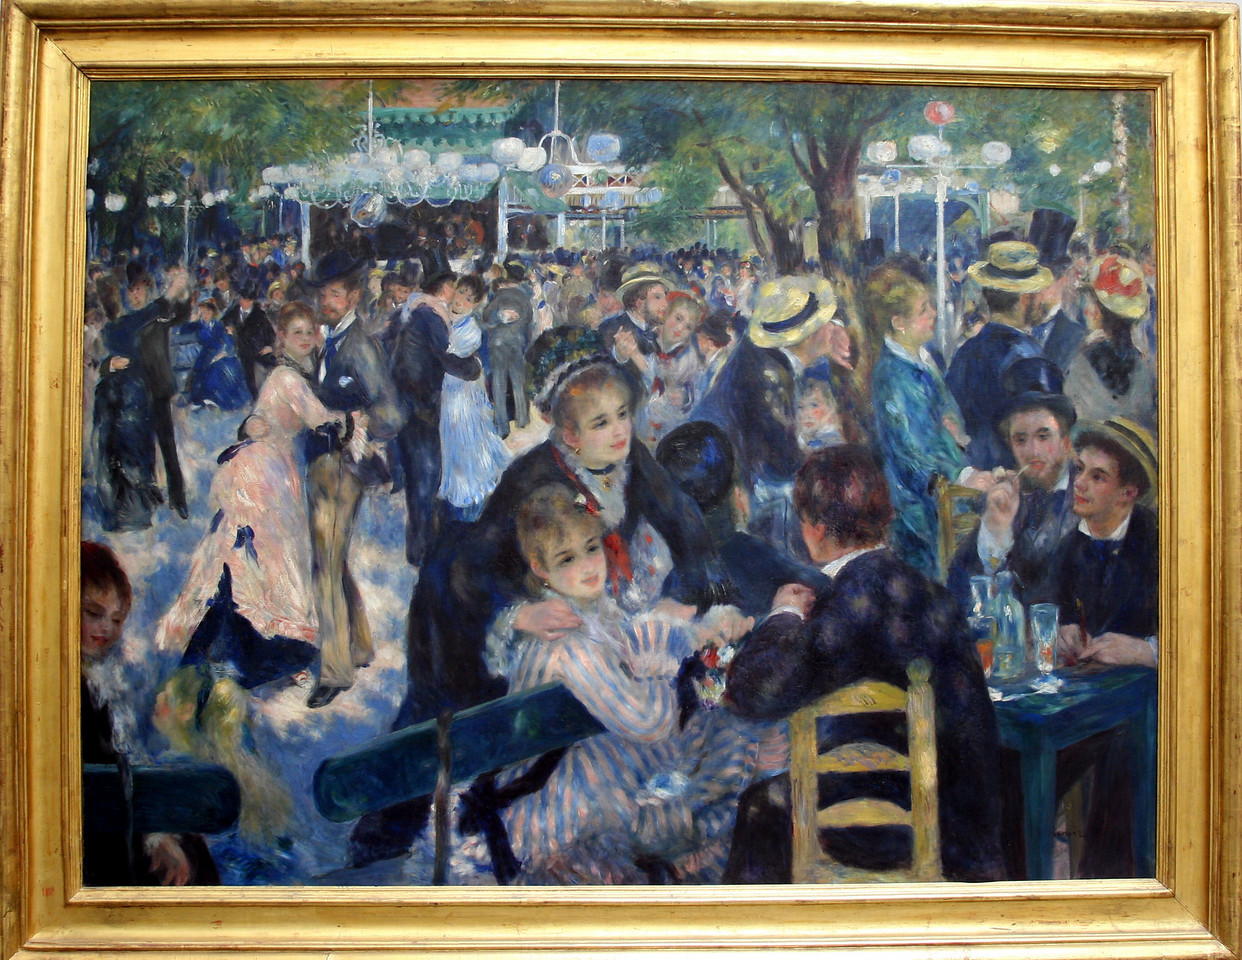 066 Musee D'Orsay 6